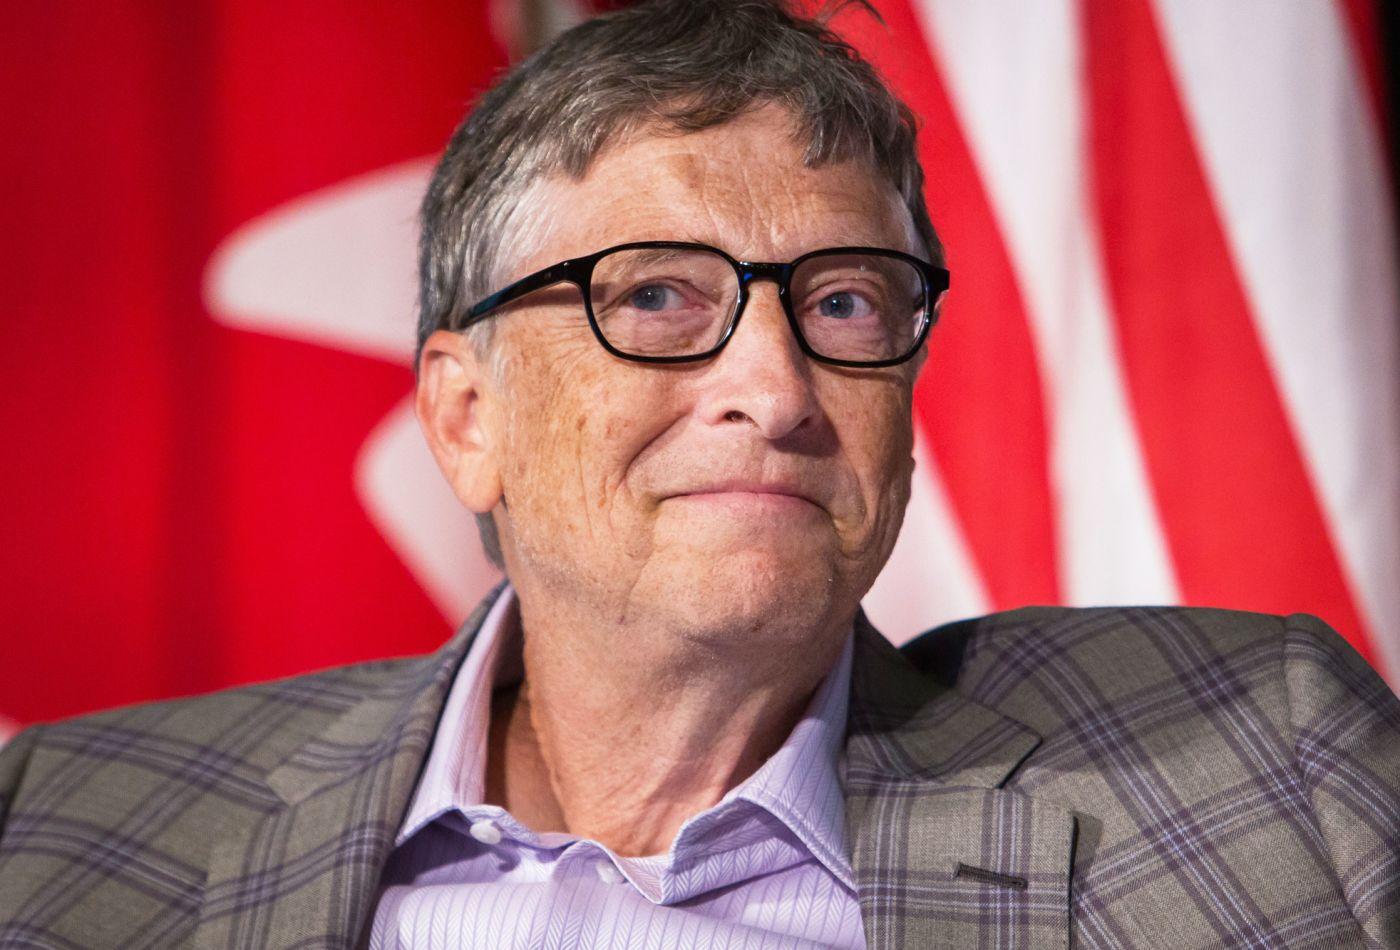 Coronavirus, per Bill Gates i risultati dei test arrivano tardi e non servono